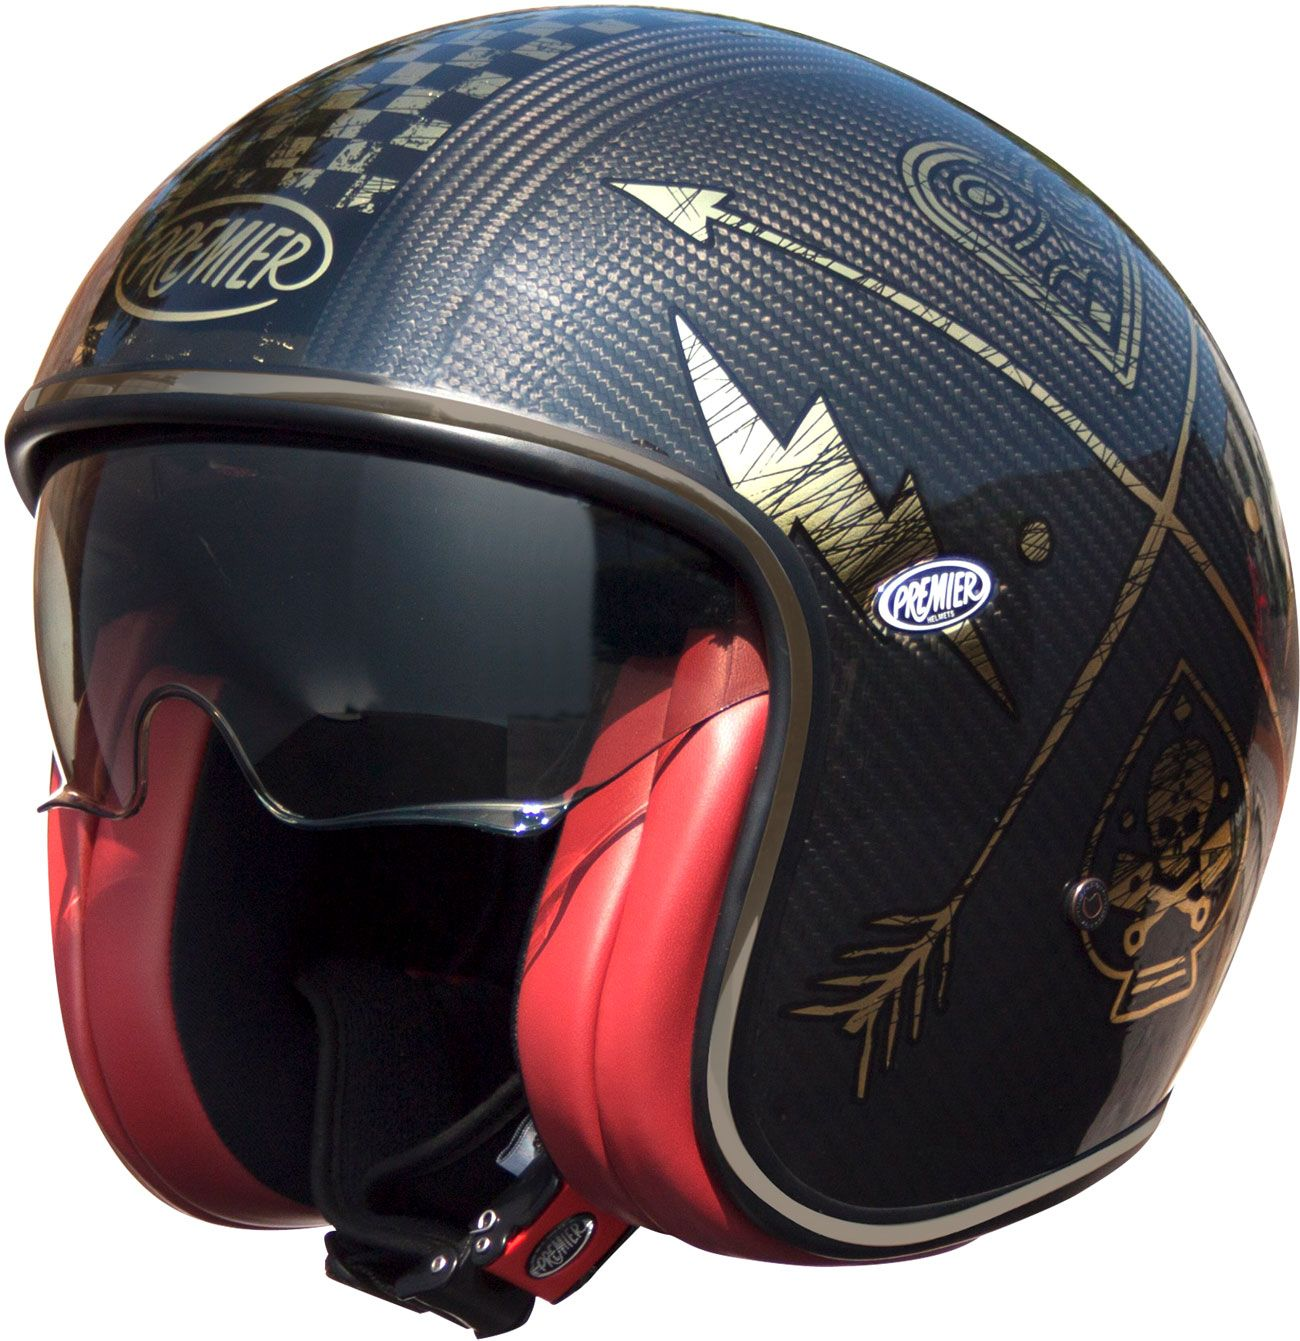 Premier Vintage Carbon Chromed Jet Helmet In 2020 Vintage Helmet Motorcycle Helmets Vintage Open Face Motorcycle Helmets